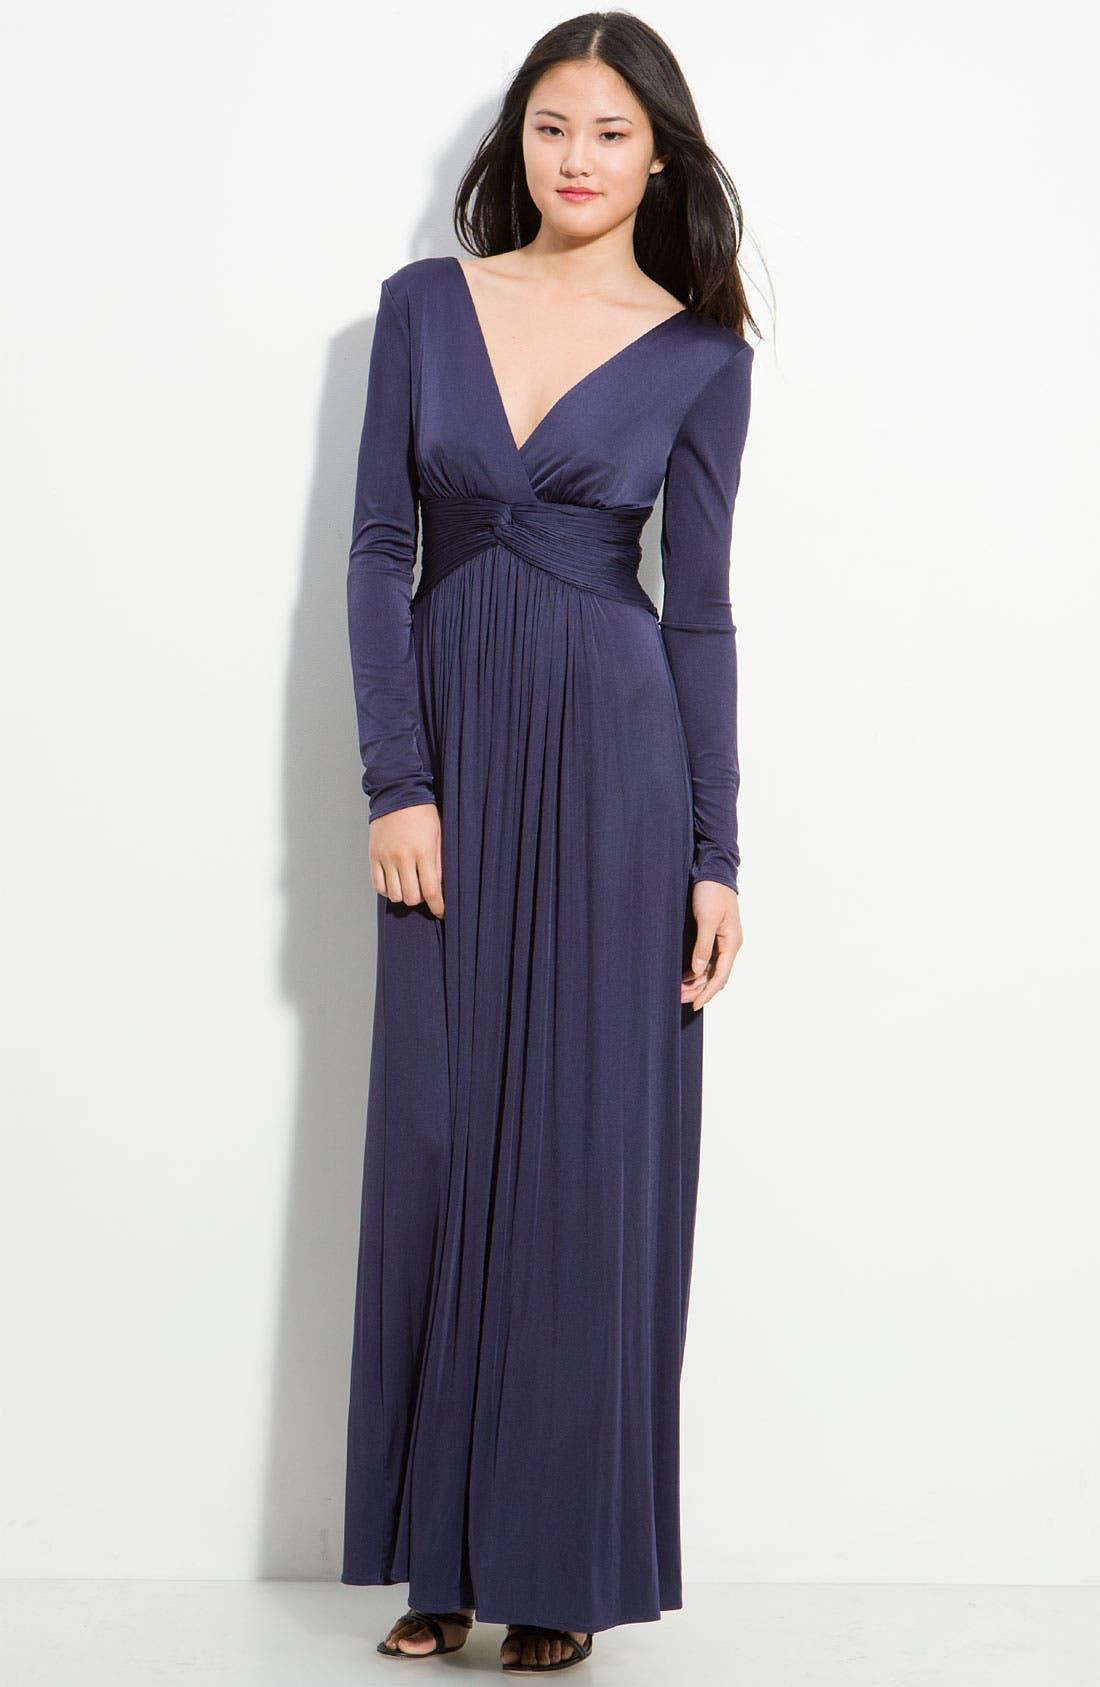 Main Image - BCBGMAXAZRIA Iridescent Jersey Gown